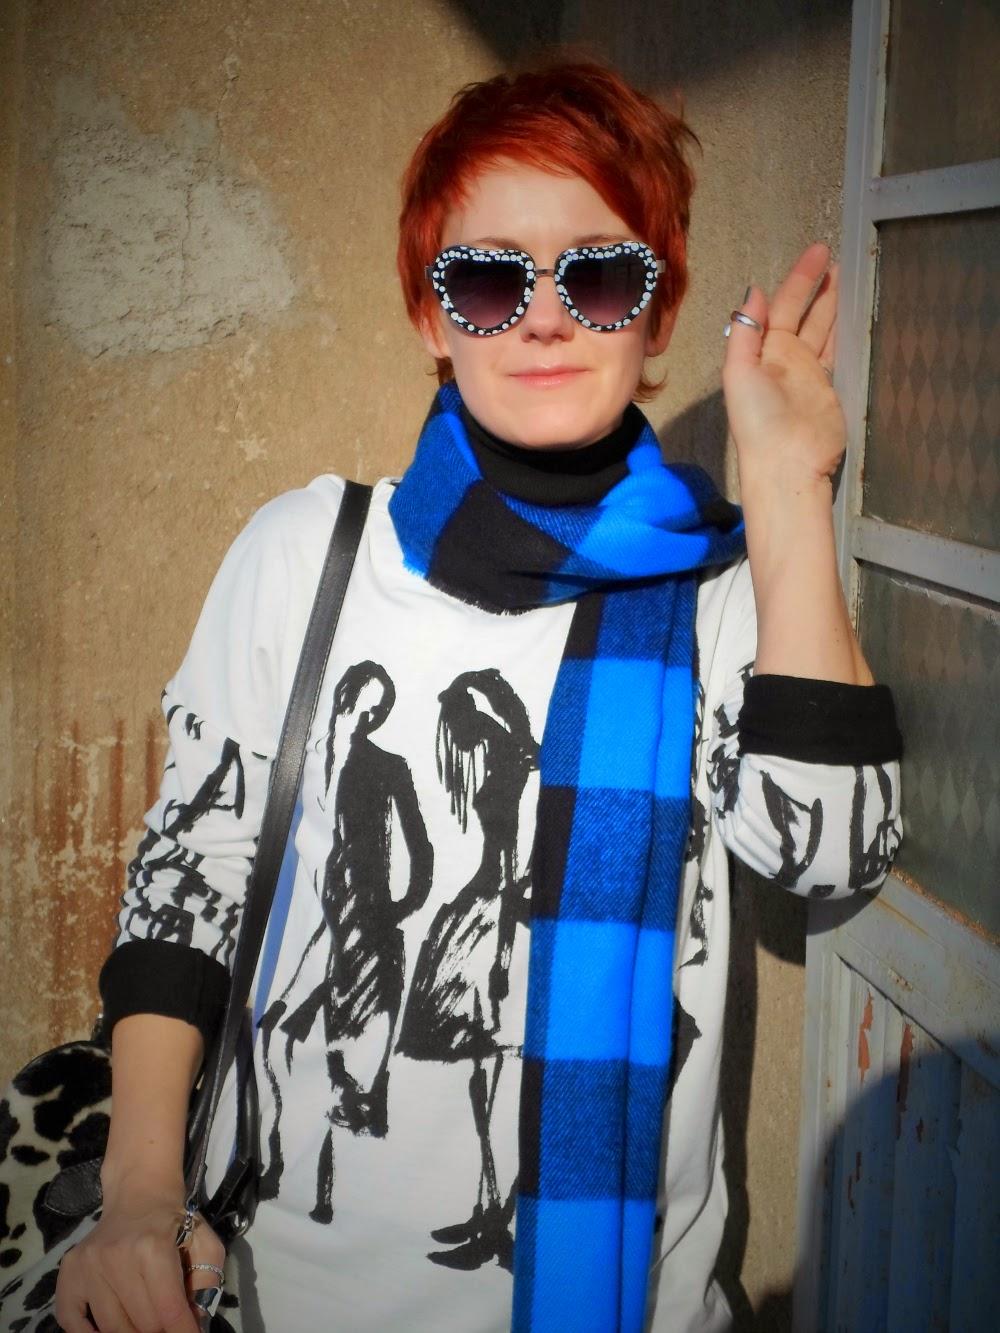 graffiti sweater, buffalo plaid scarf,  heart shape sunglasses - Gotta Kiss Myself I'm So Pretty | Funky Jungle